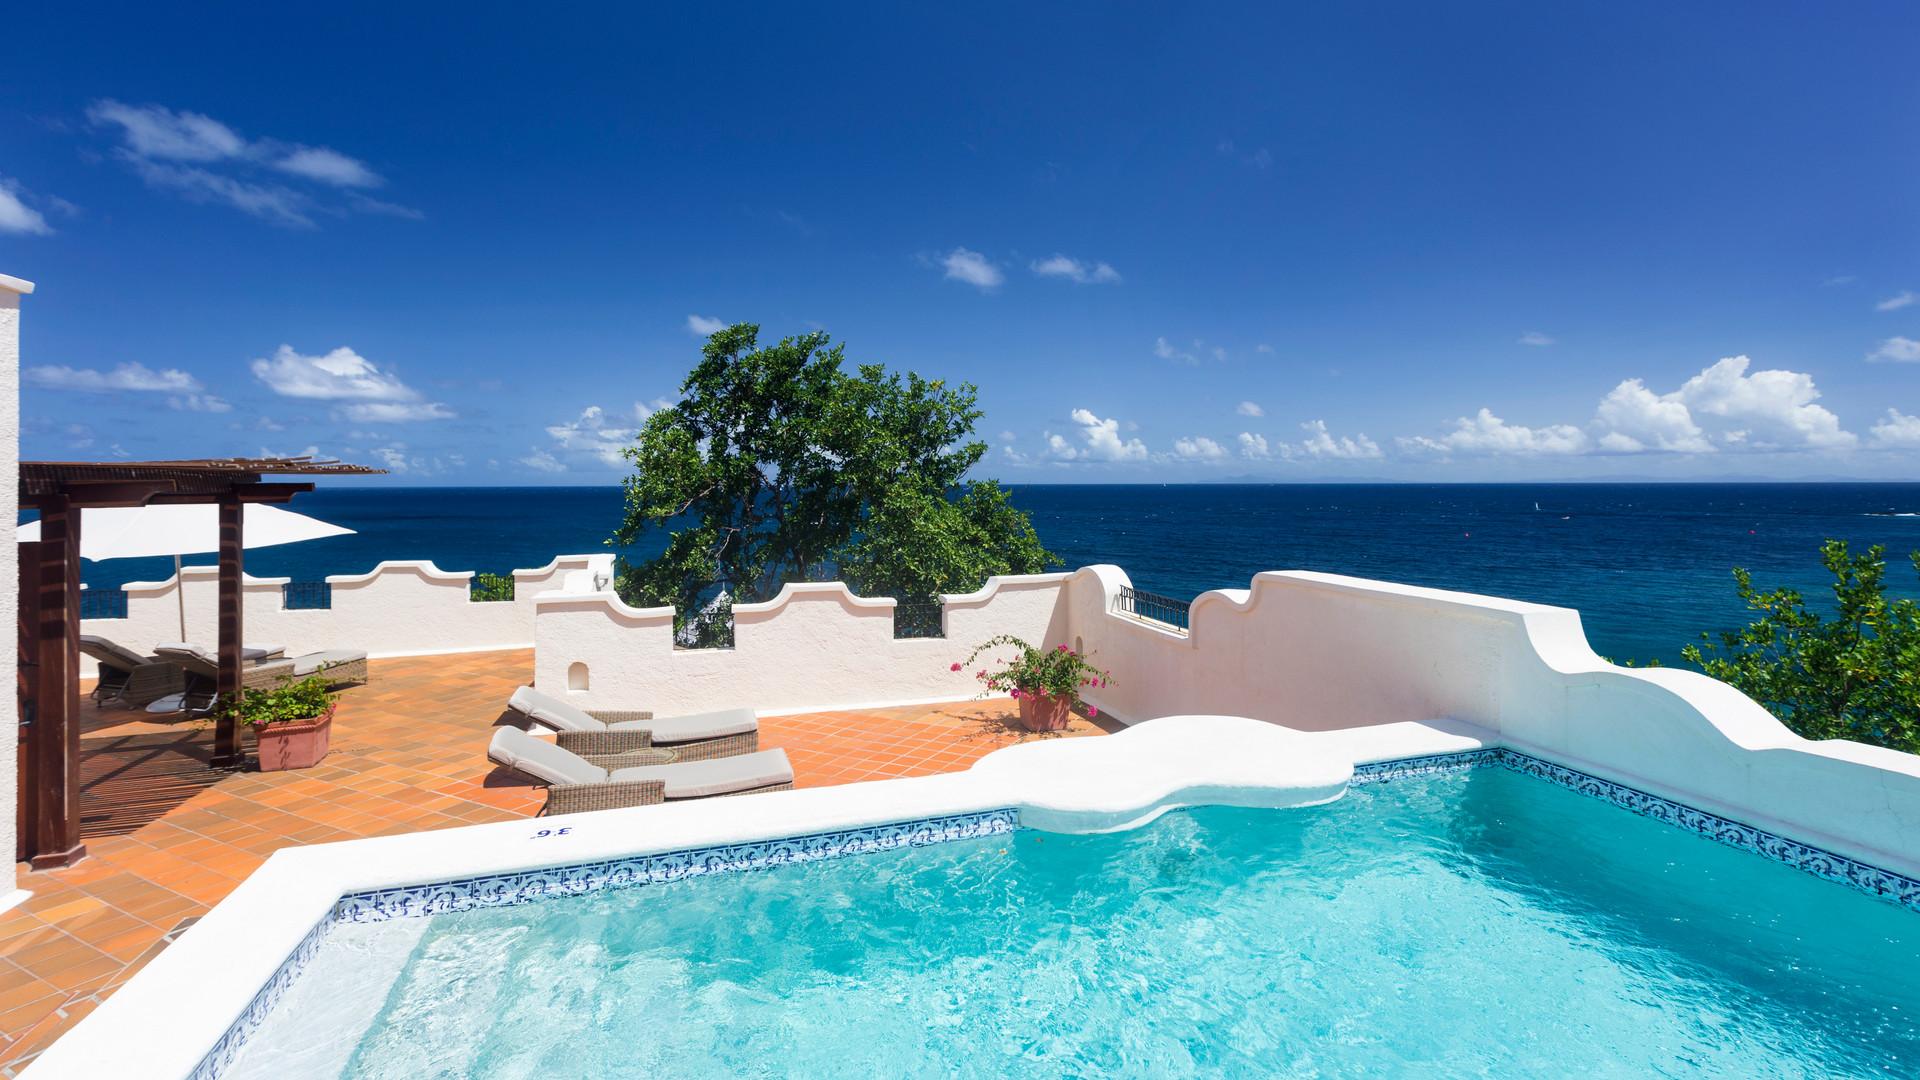 Cap Maison St Lucia | VIE Luxury Hotel Representation